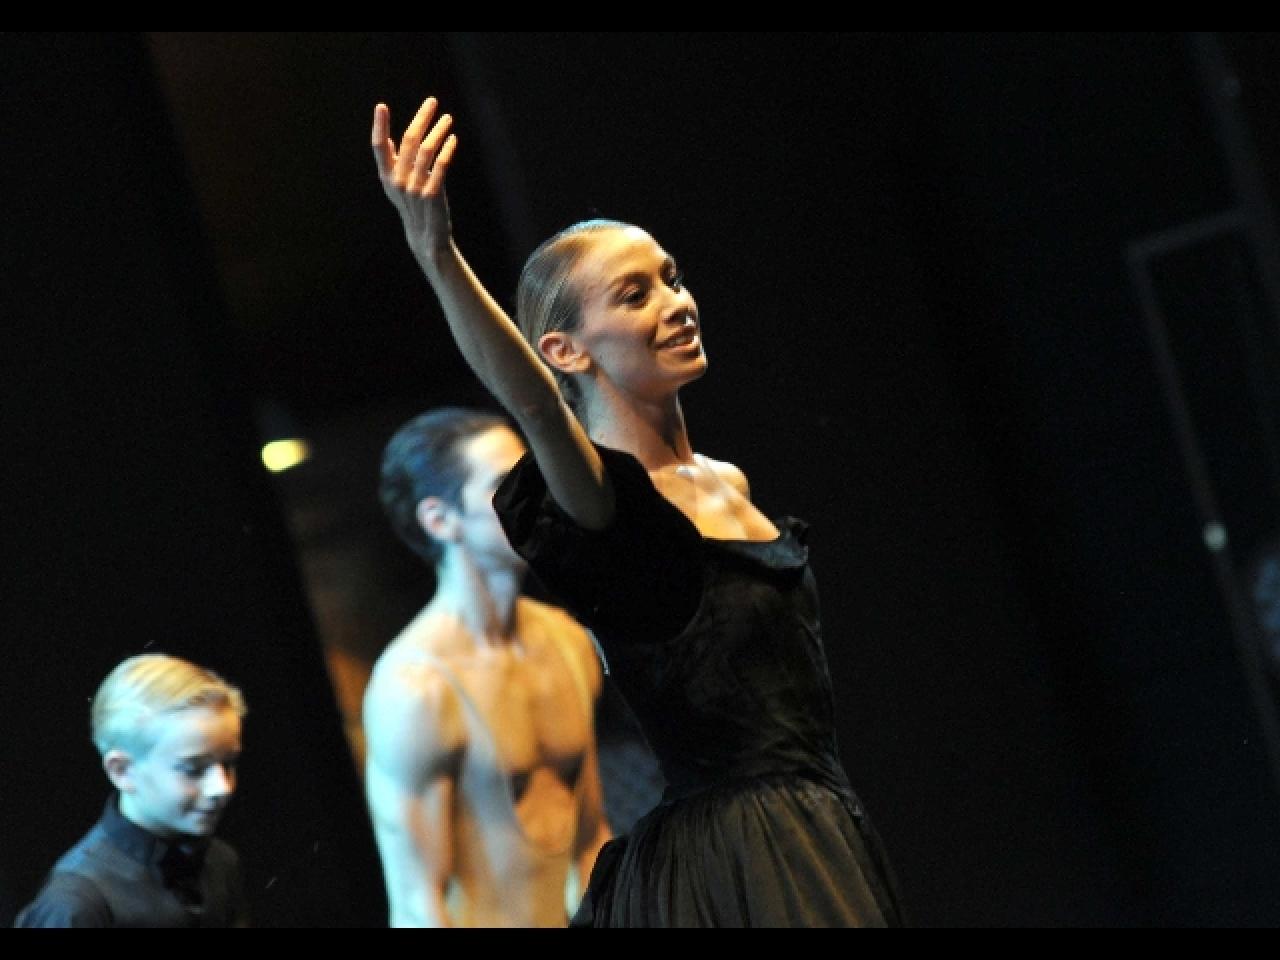 Abbagnato con Opera Parigi a Taormina - MYmovies.it